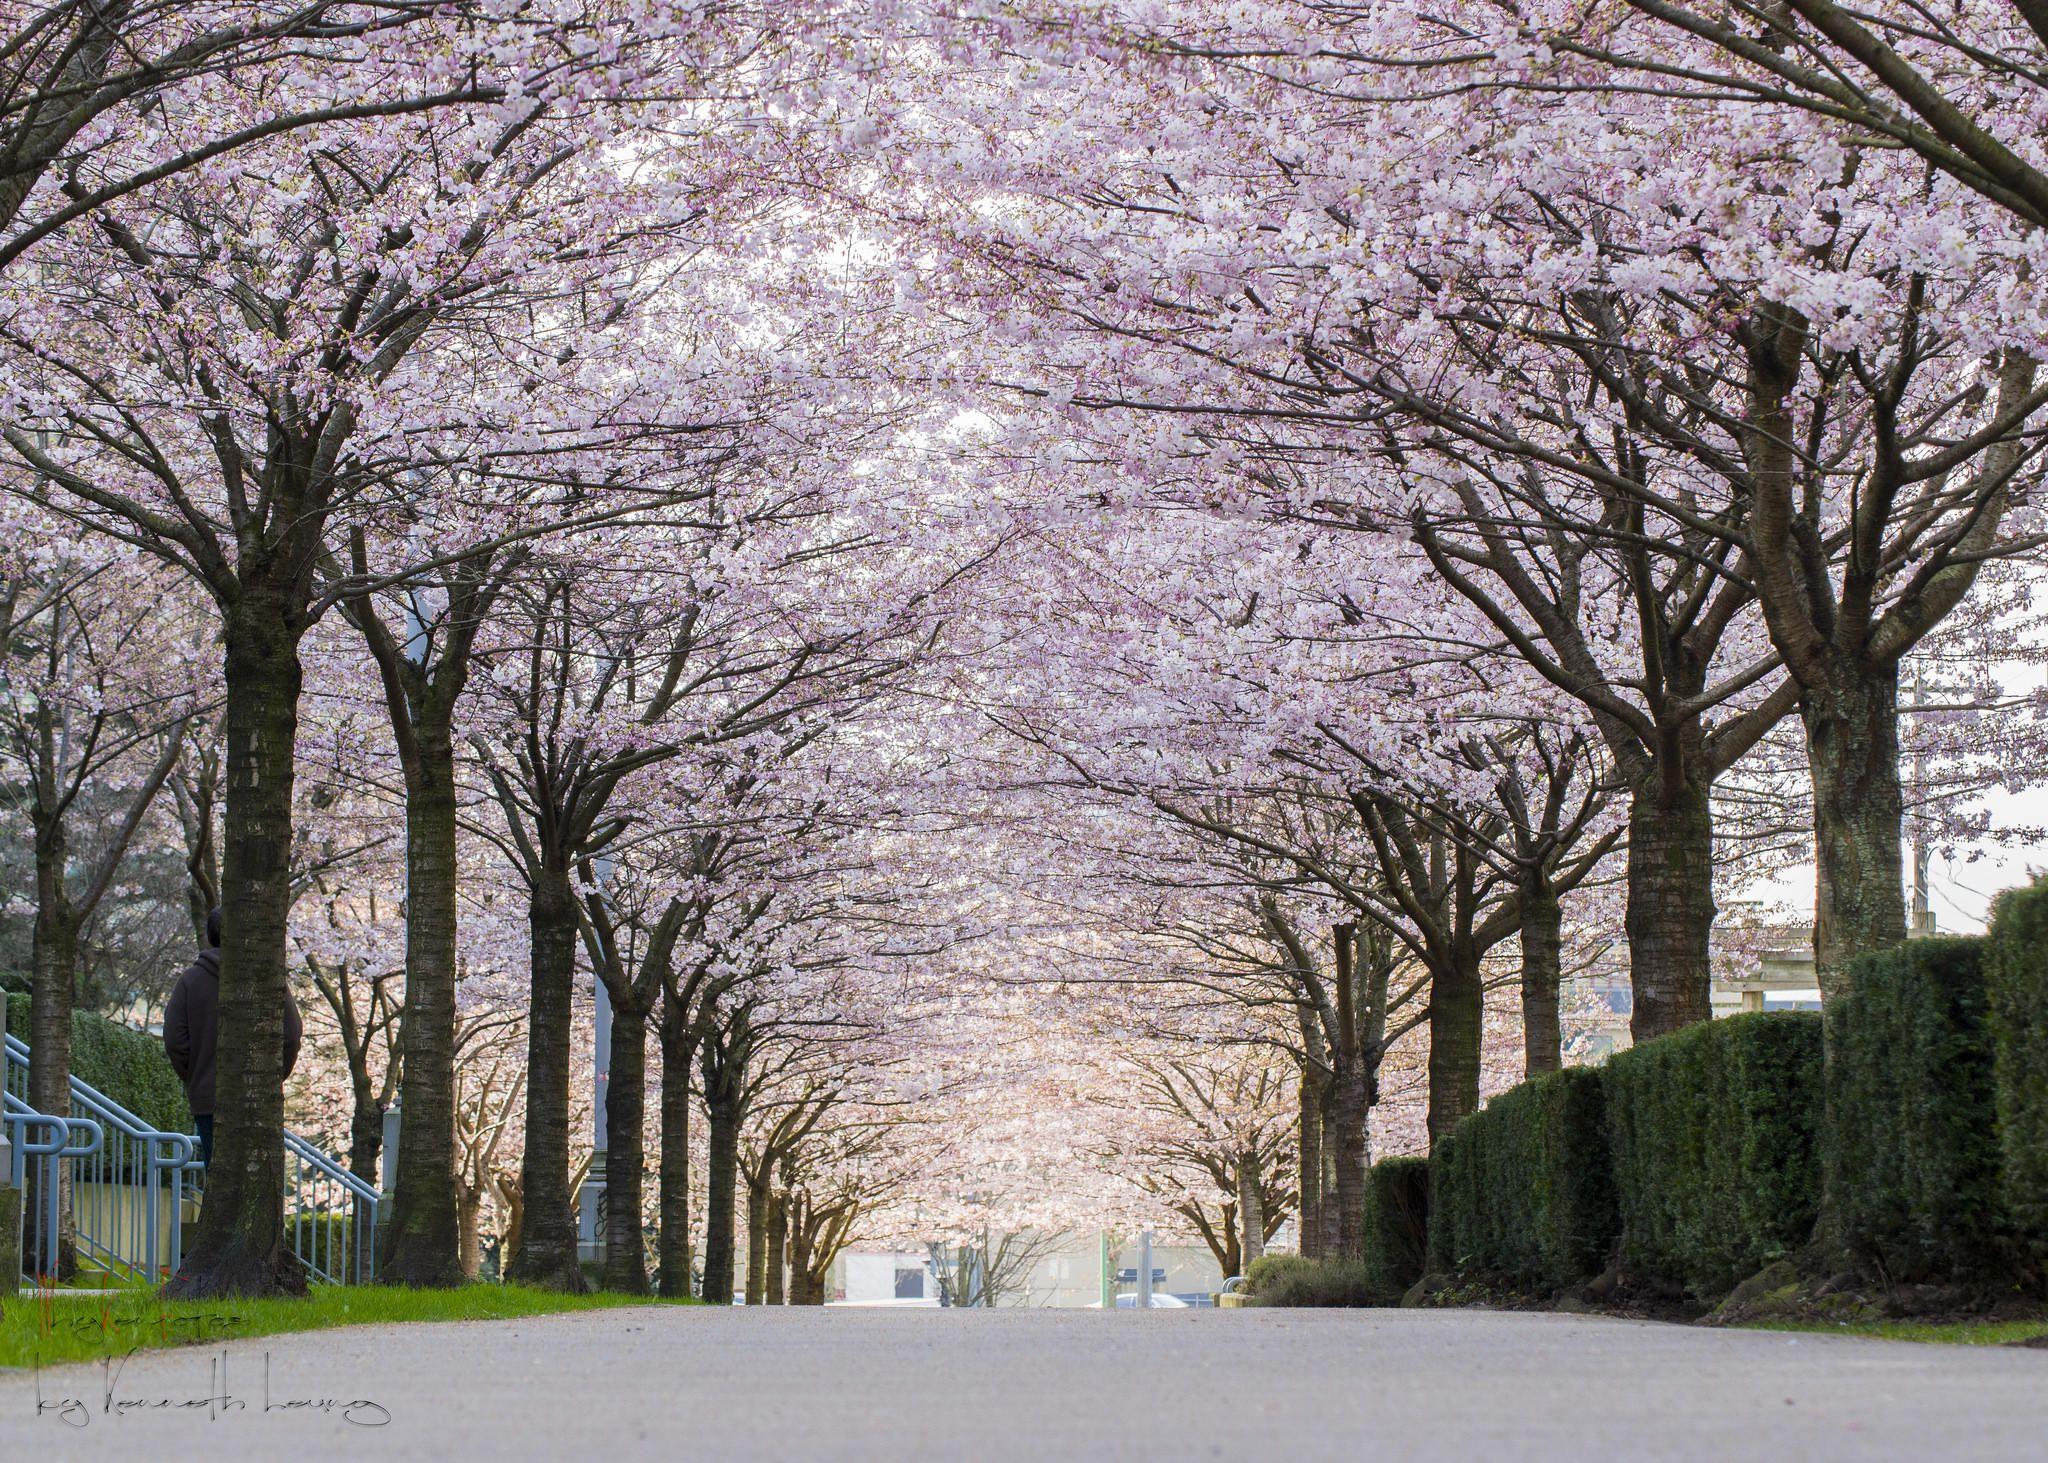 A Guide To Vancouver S Cherry Blossoms Cherry Blossom Festival Canada Photography Cherry Blossom Season